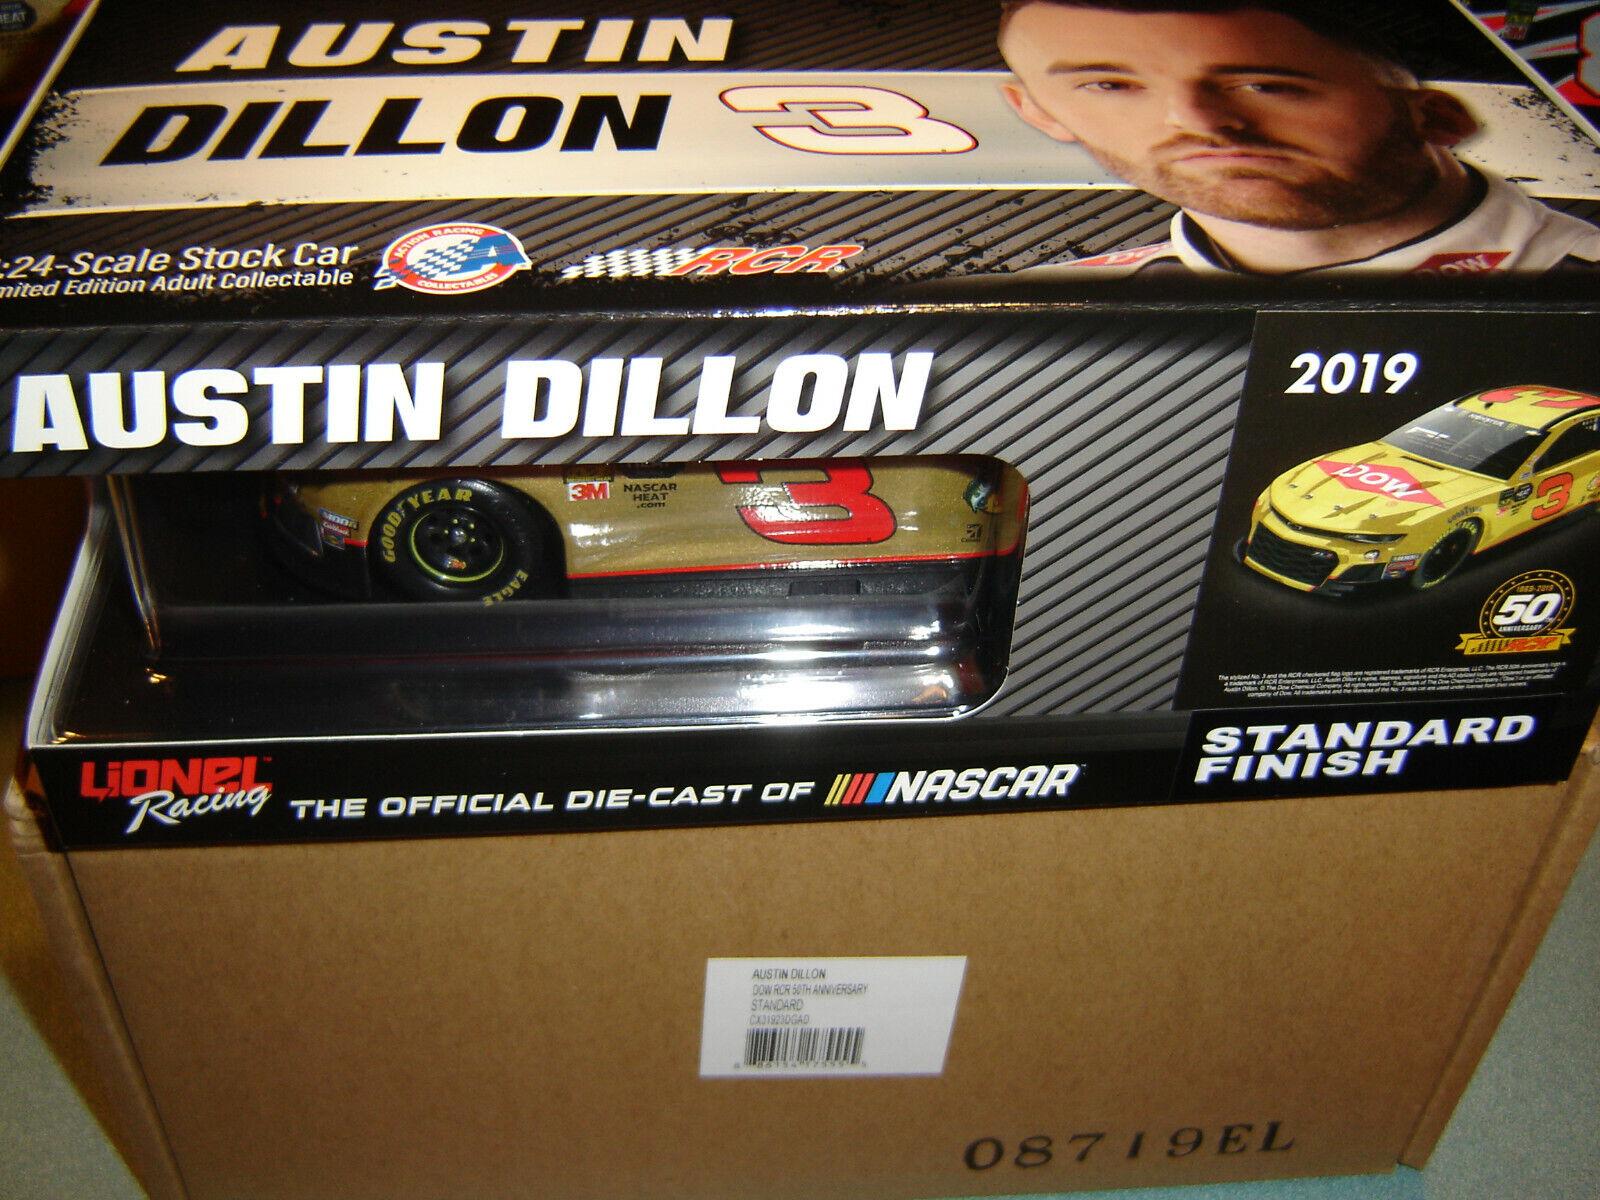 Lionel Racing Austin Dillon 2019 RCR 50th Anniversary Dow NASCAR Diecast Car 1:64 Scale